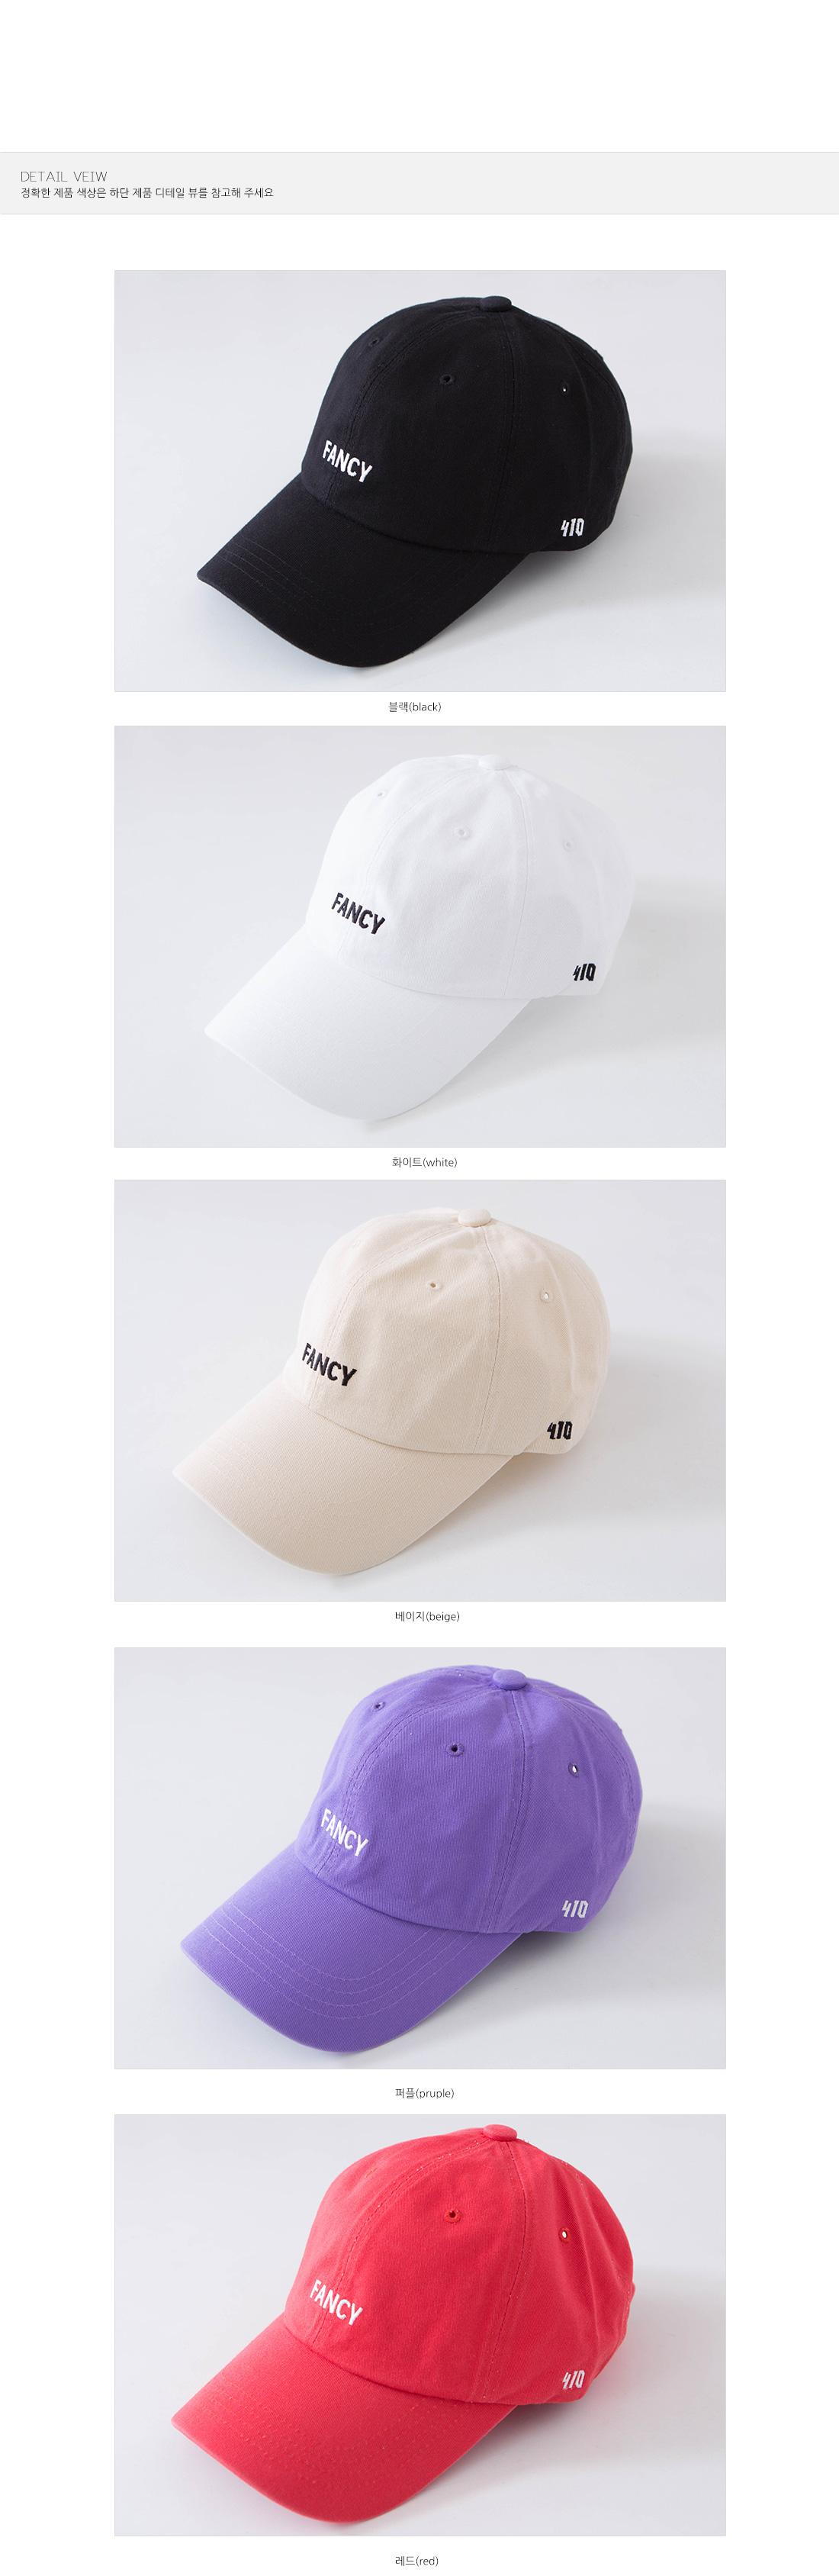 Fancy Lettering Embroidery Cap Hat #85121